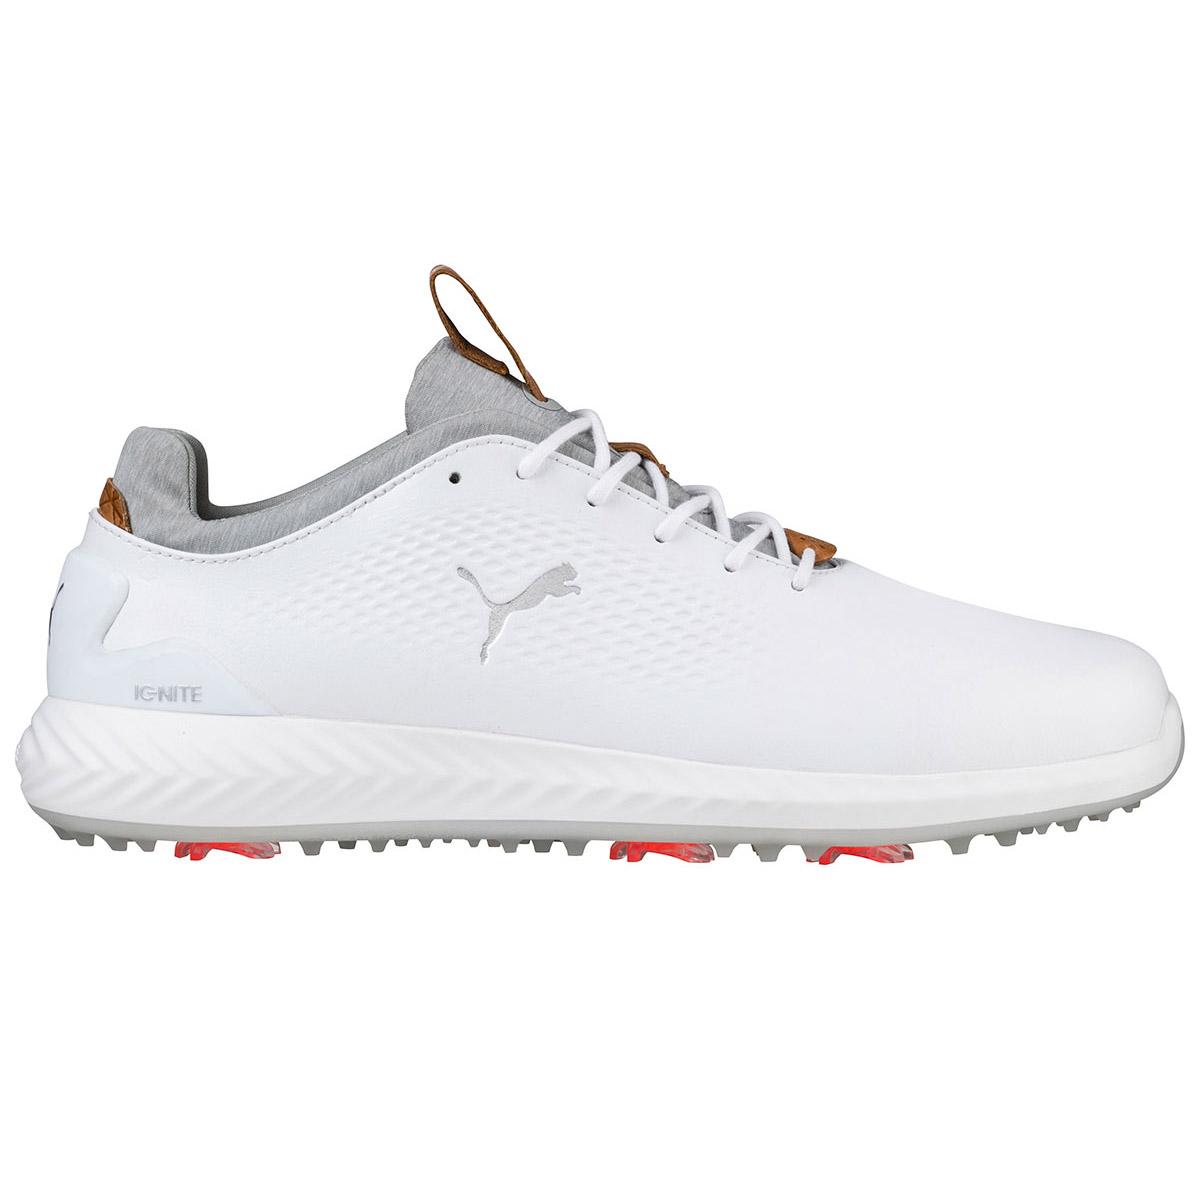 580d9a7b2a PUMA Golf IGNITE PWRADAPT Leather Shoes